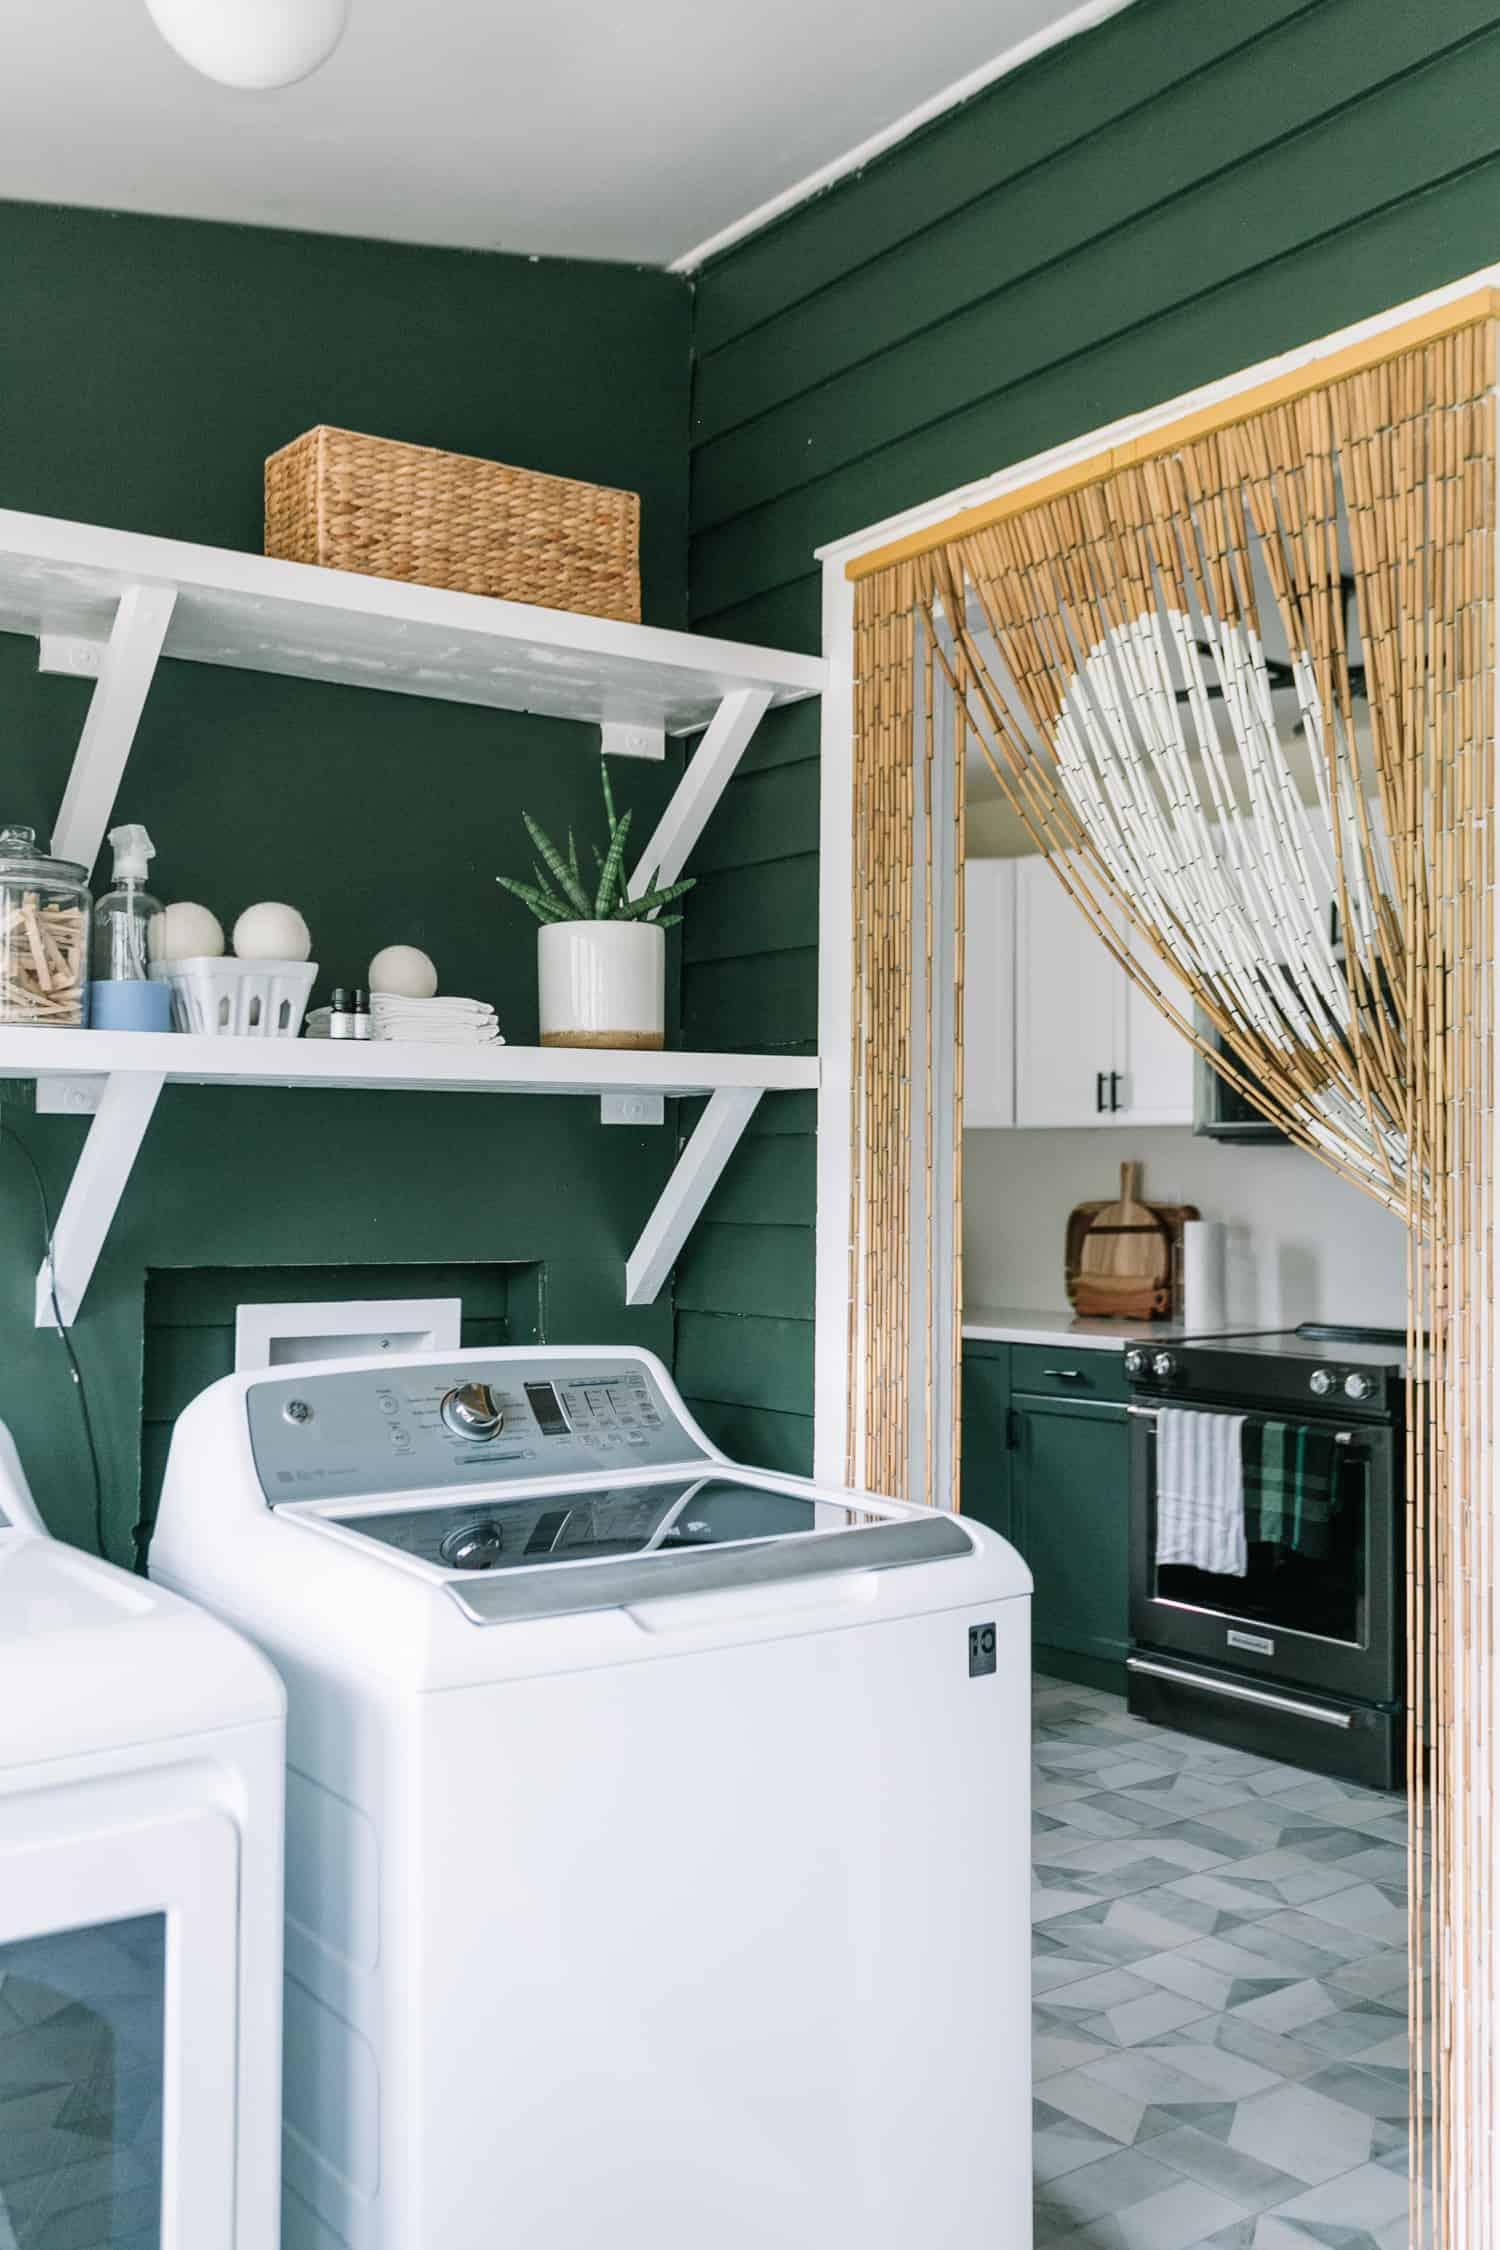 Laundry Room Design + Organization Tips - A Beautiful Mess